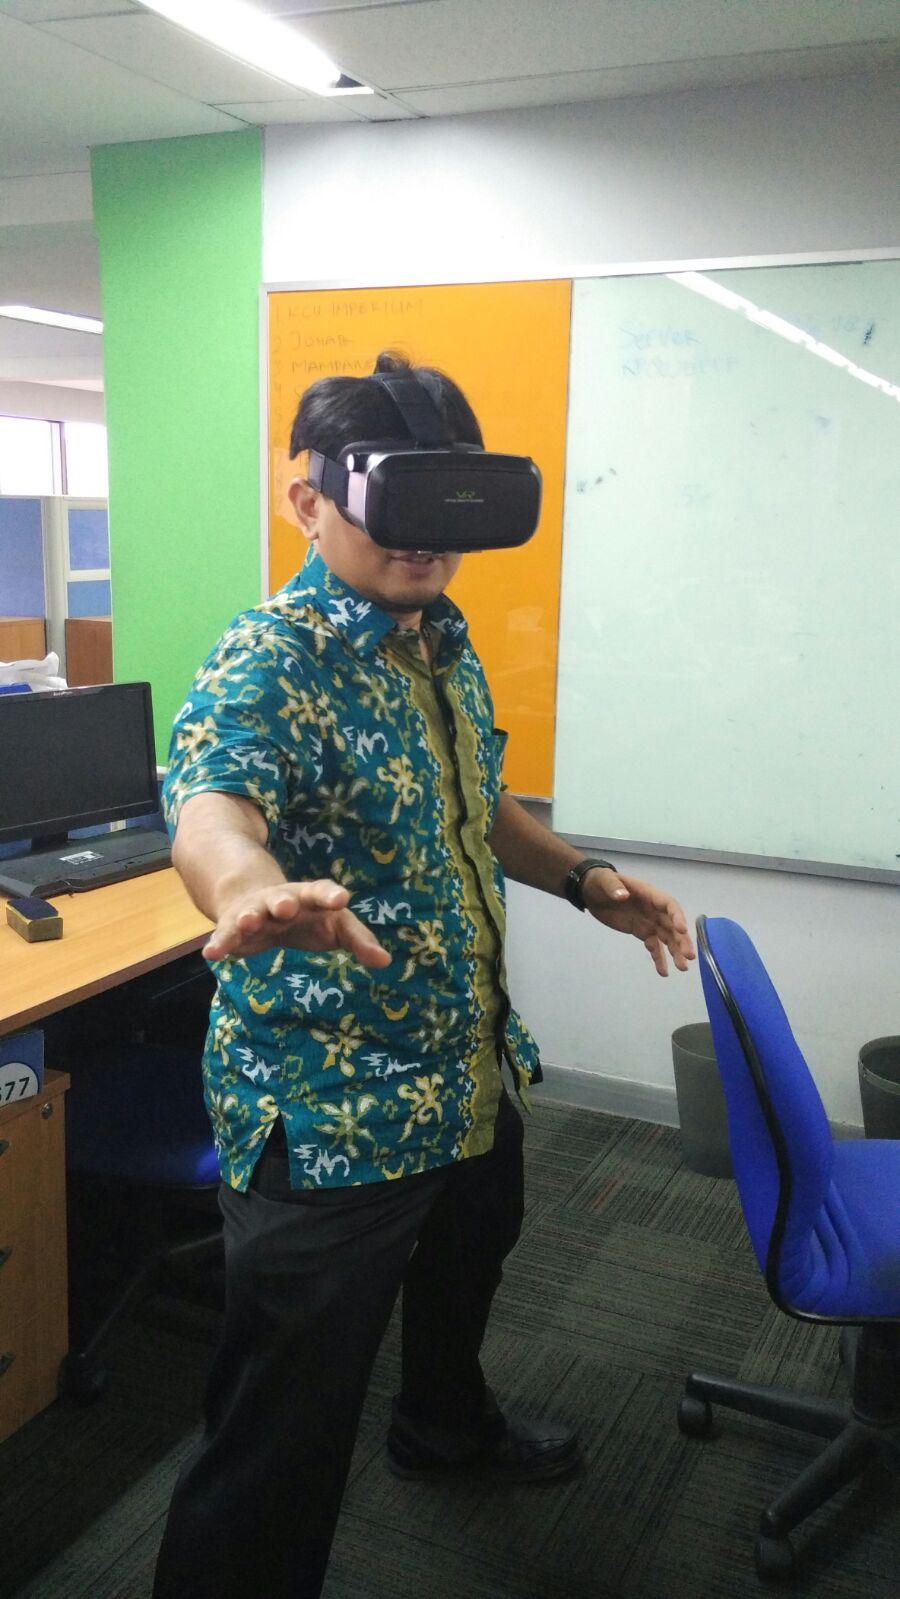 Kacamata Virtual Reality Murah Meriah Untold Contemplation